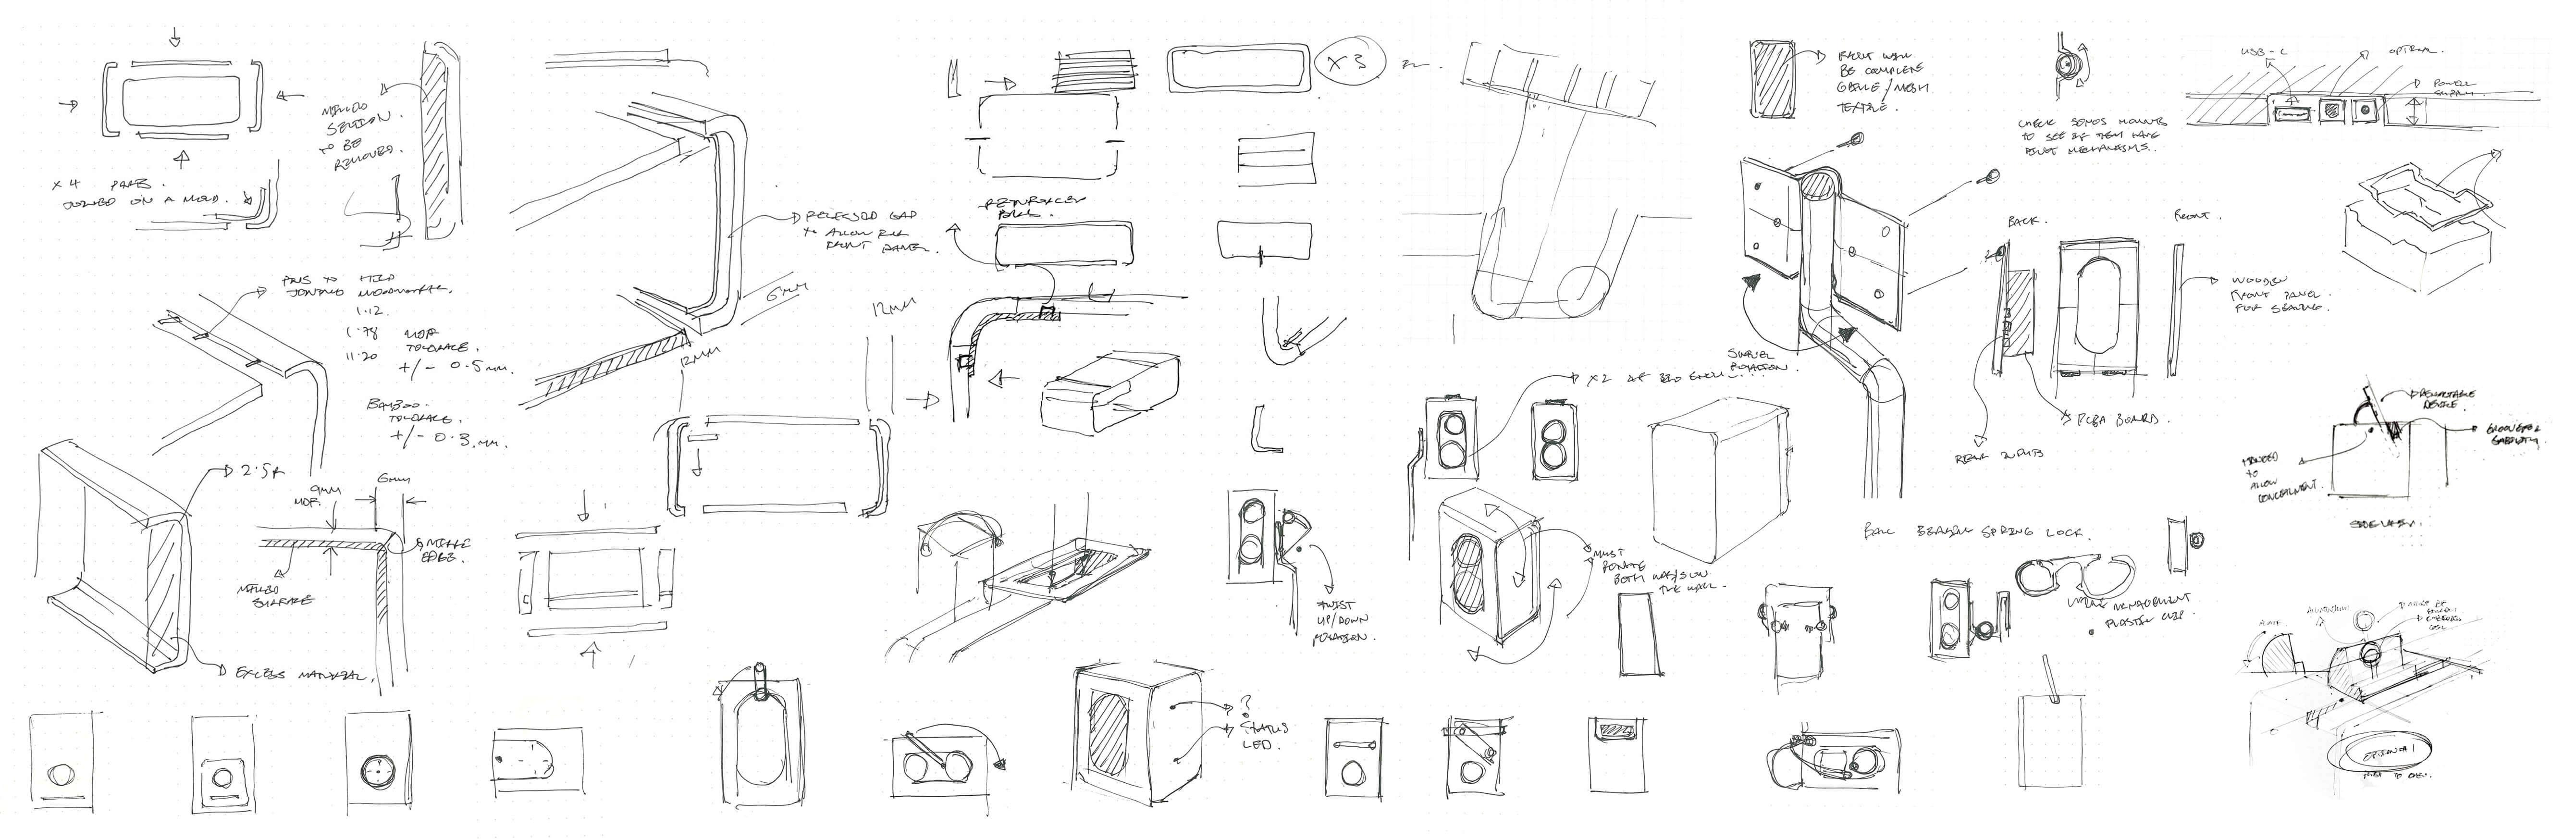 DOCK Sketches portfolio layout